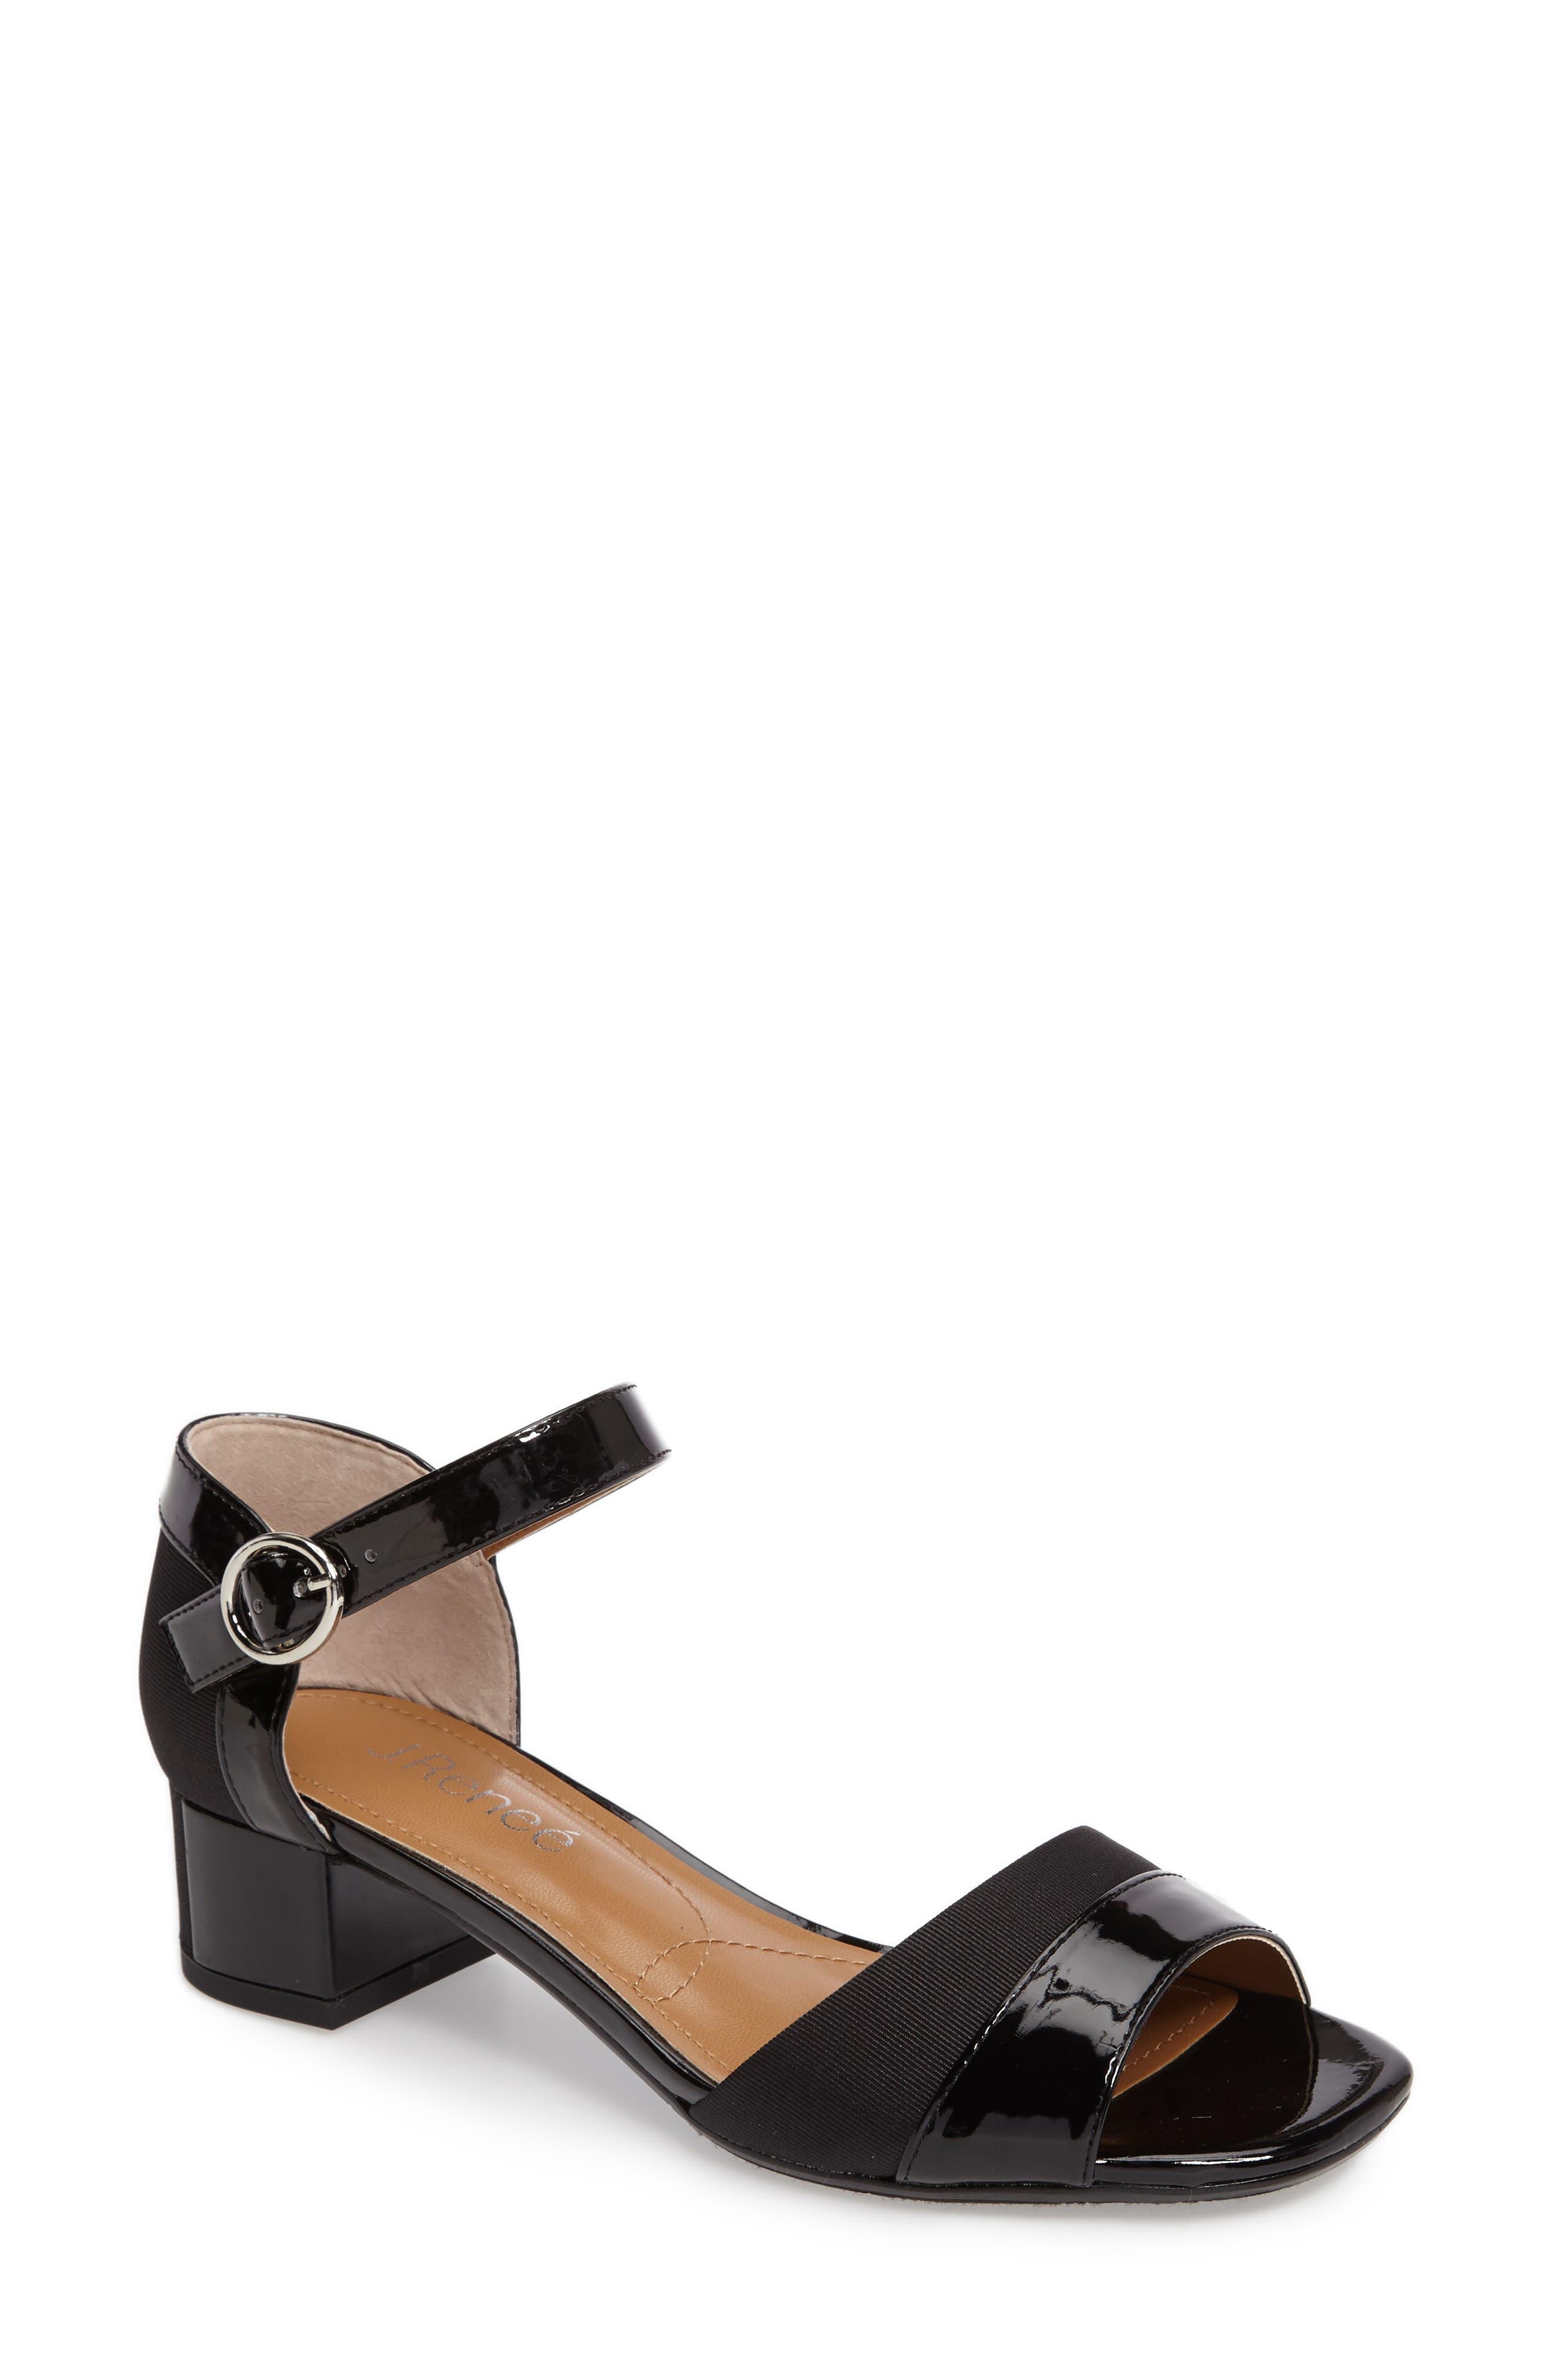 Pebblebeach Block Heel Sandal,                             Main thumbnail 1, color,                             001